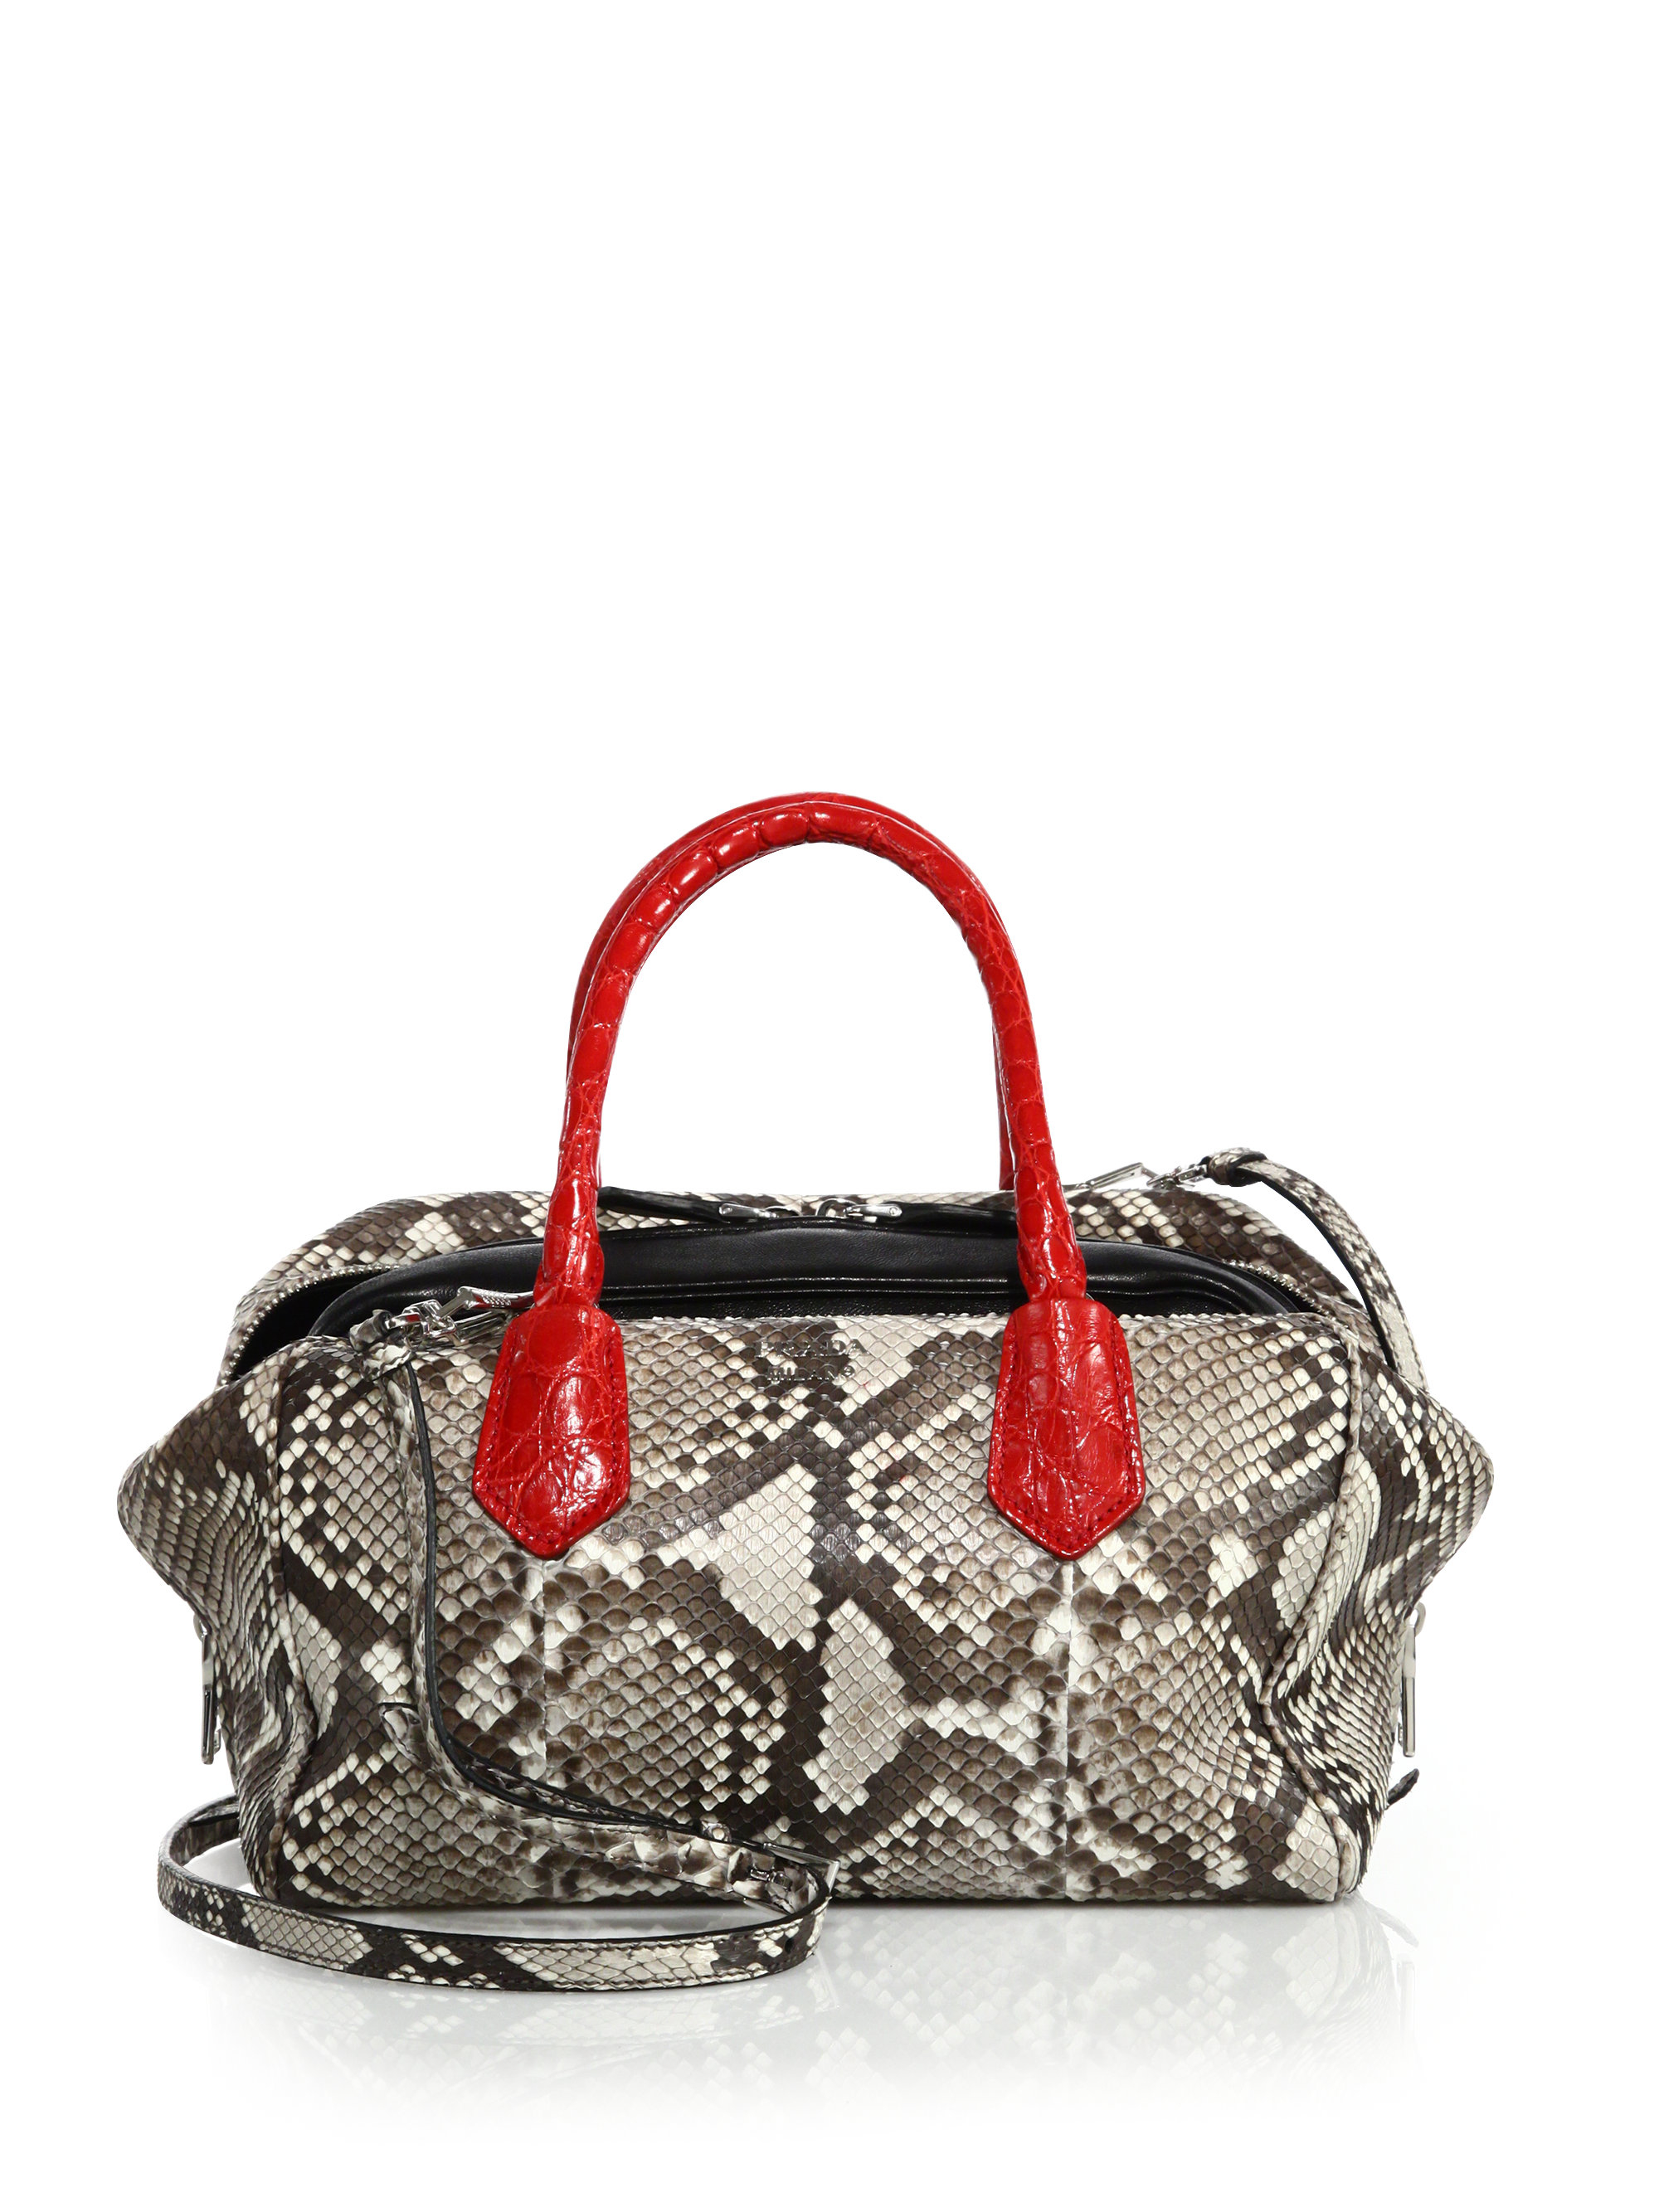 prada bag collections - Prada Python \u0026amp; Crocodile Inside Bag in Red (natural-red) | Lyst